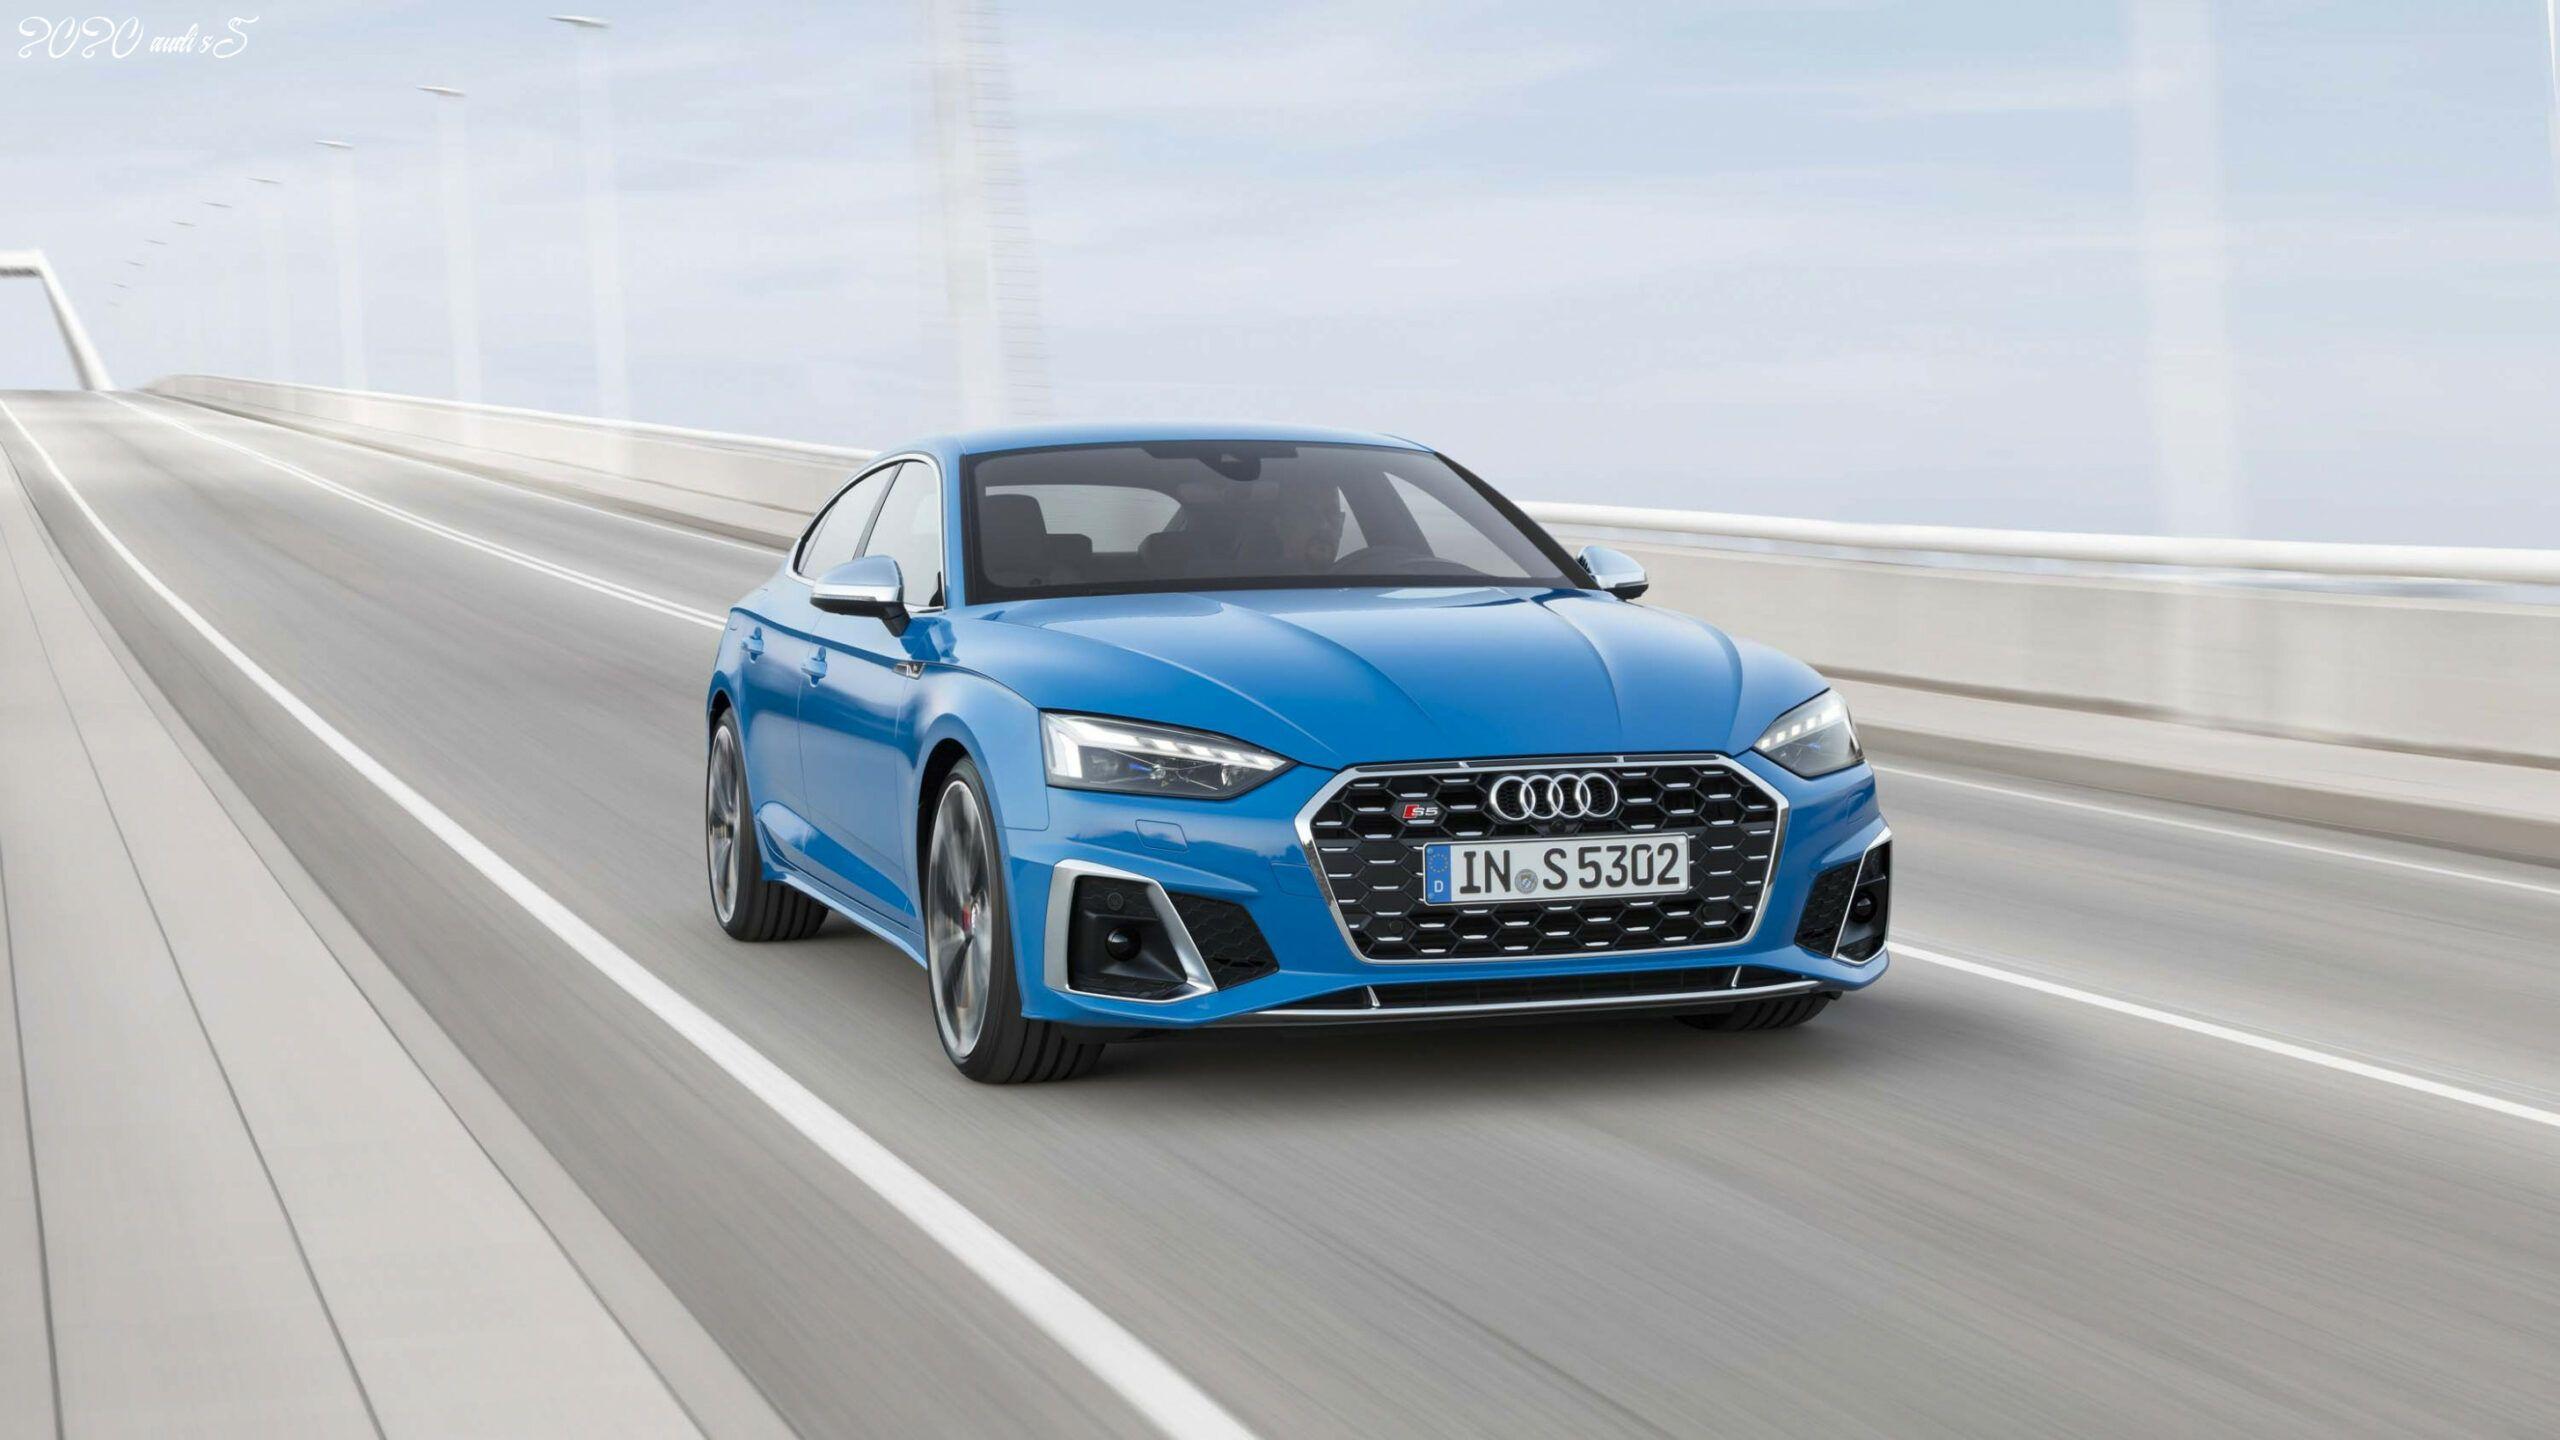 2020 Audi S5 In 2020 Audi S5 Audi A5 Coupe Audi A5